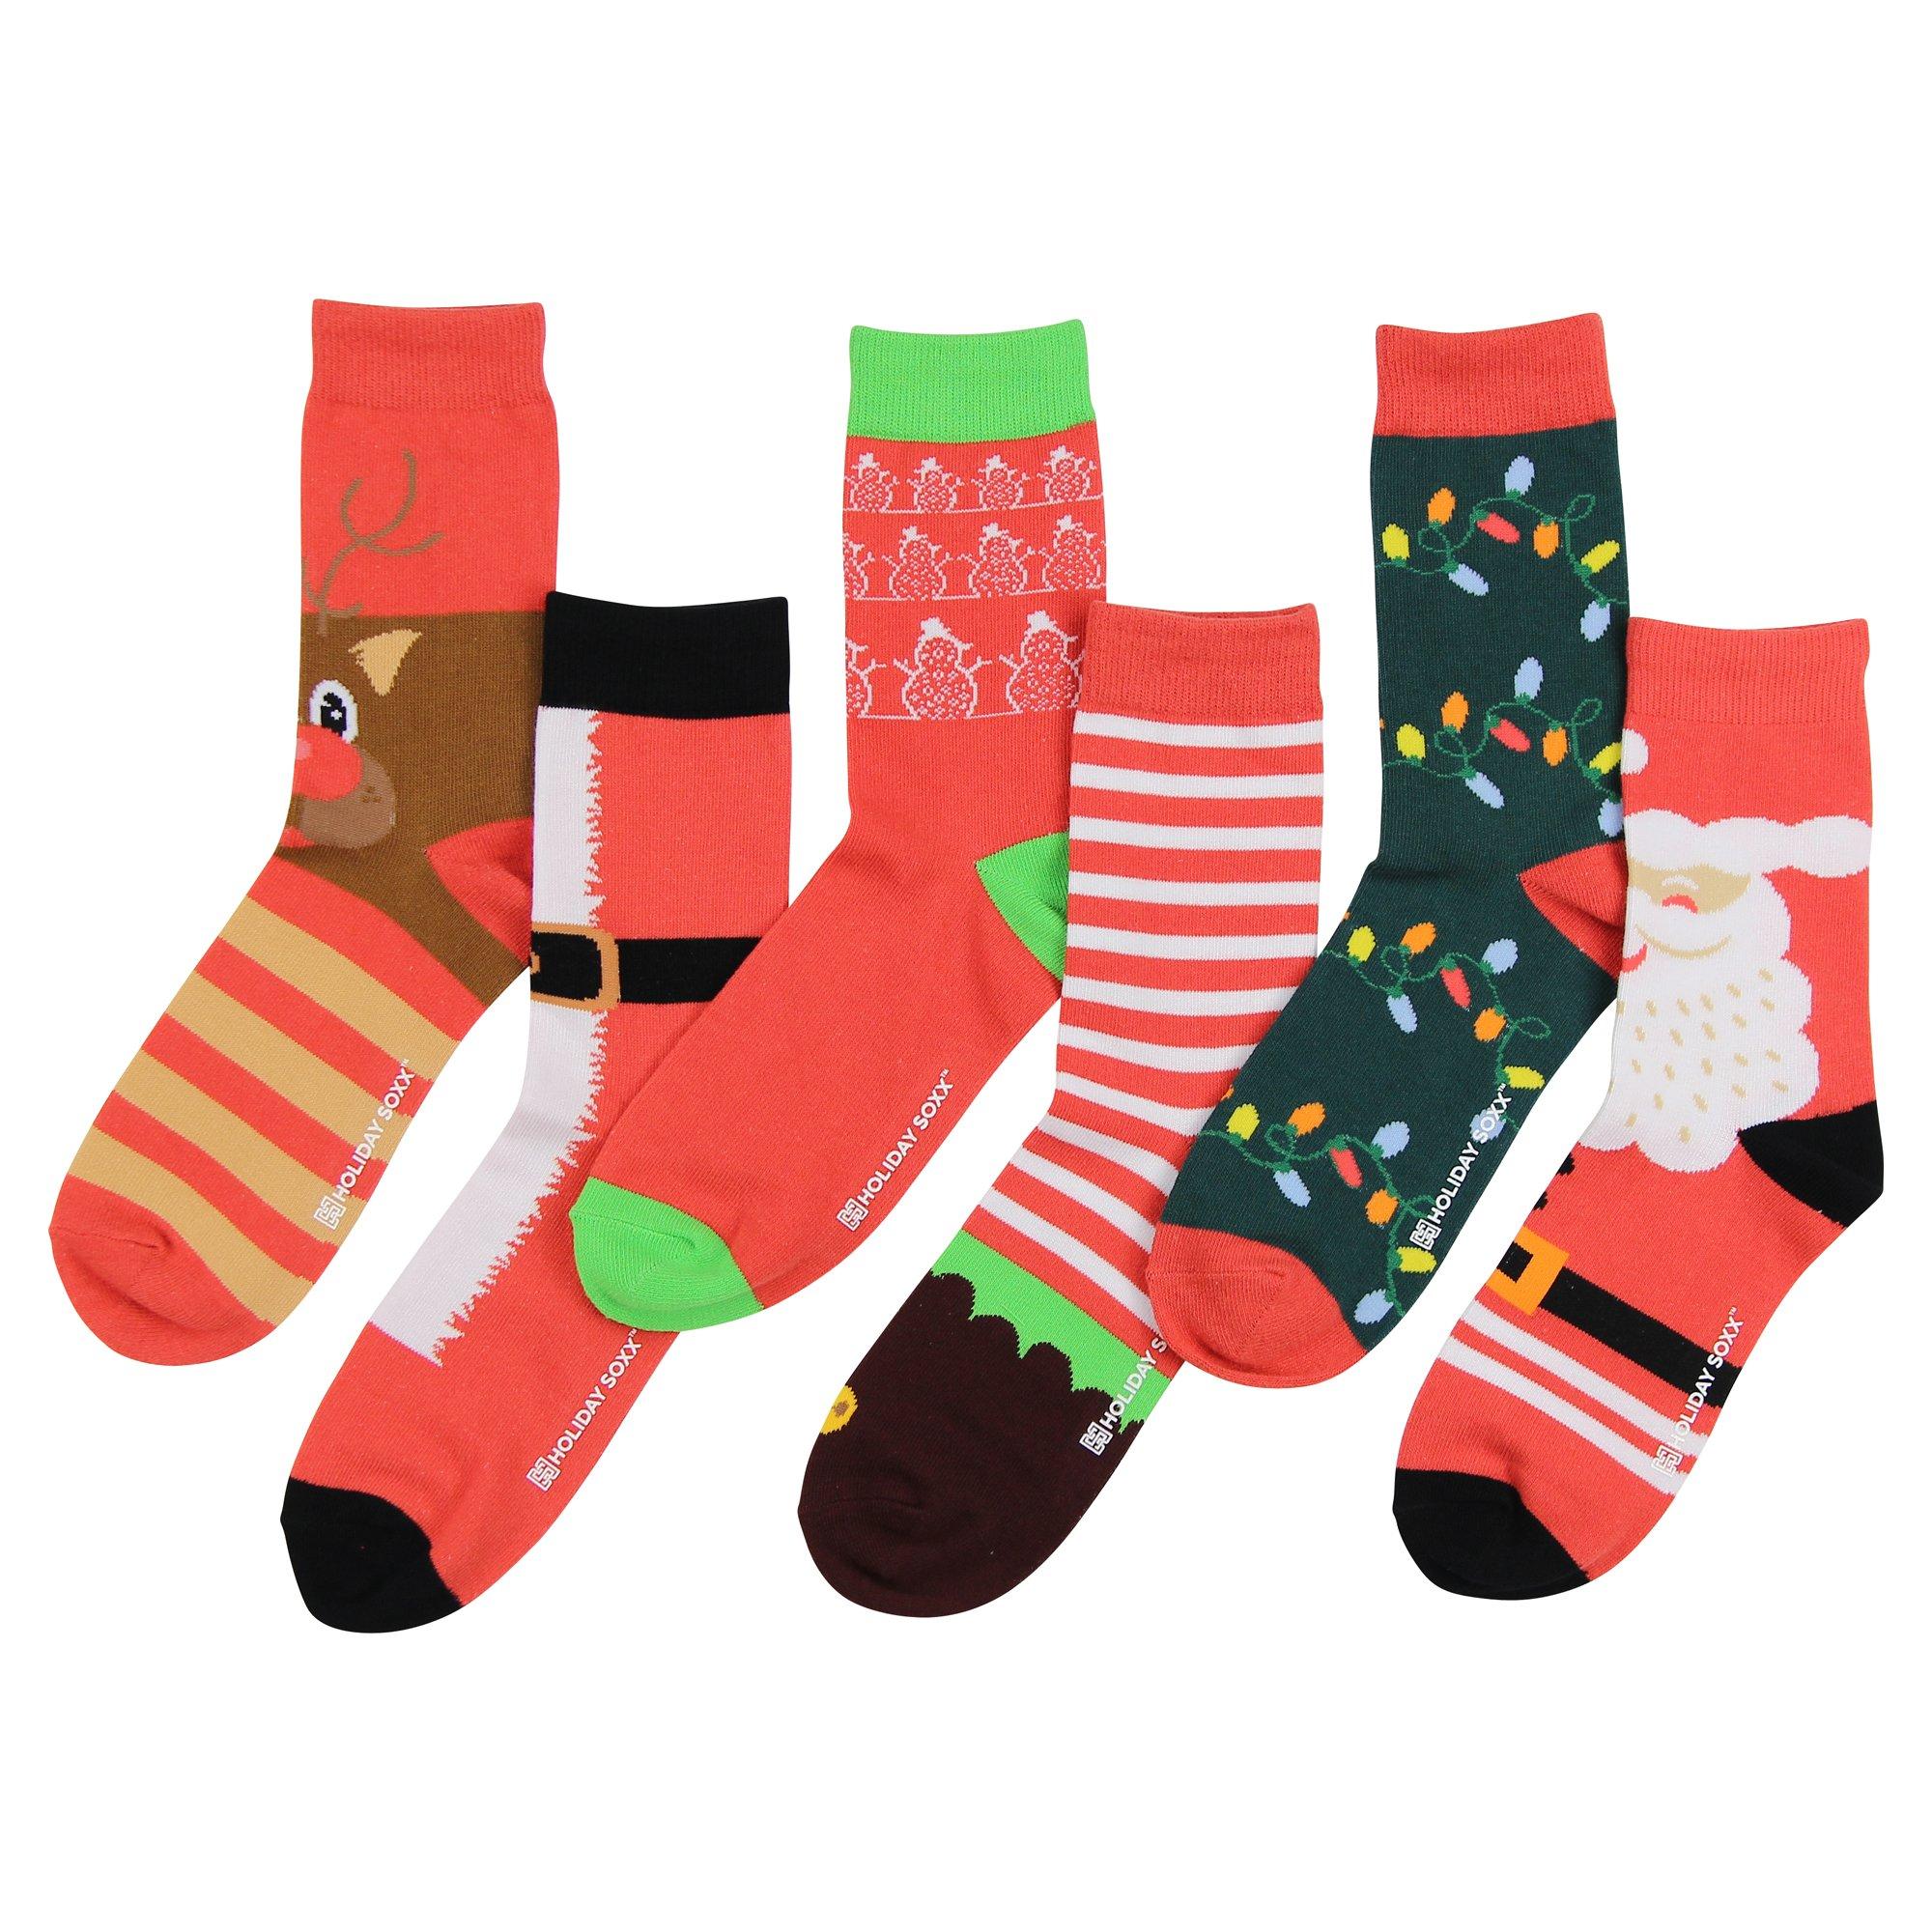 Women's Premium Fun and Colorful Crew Socks (6 Pack) (Christmas ''Ho Ho Ho'')